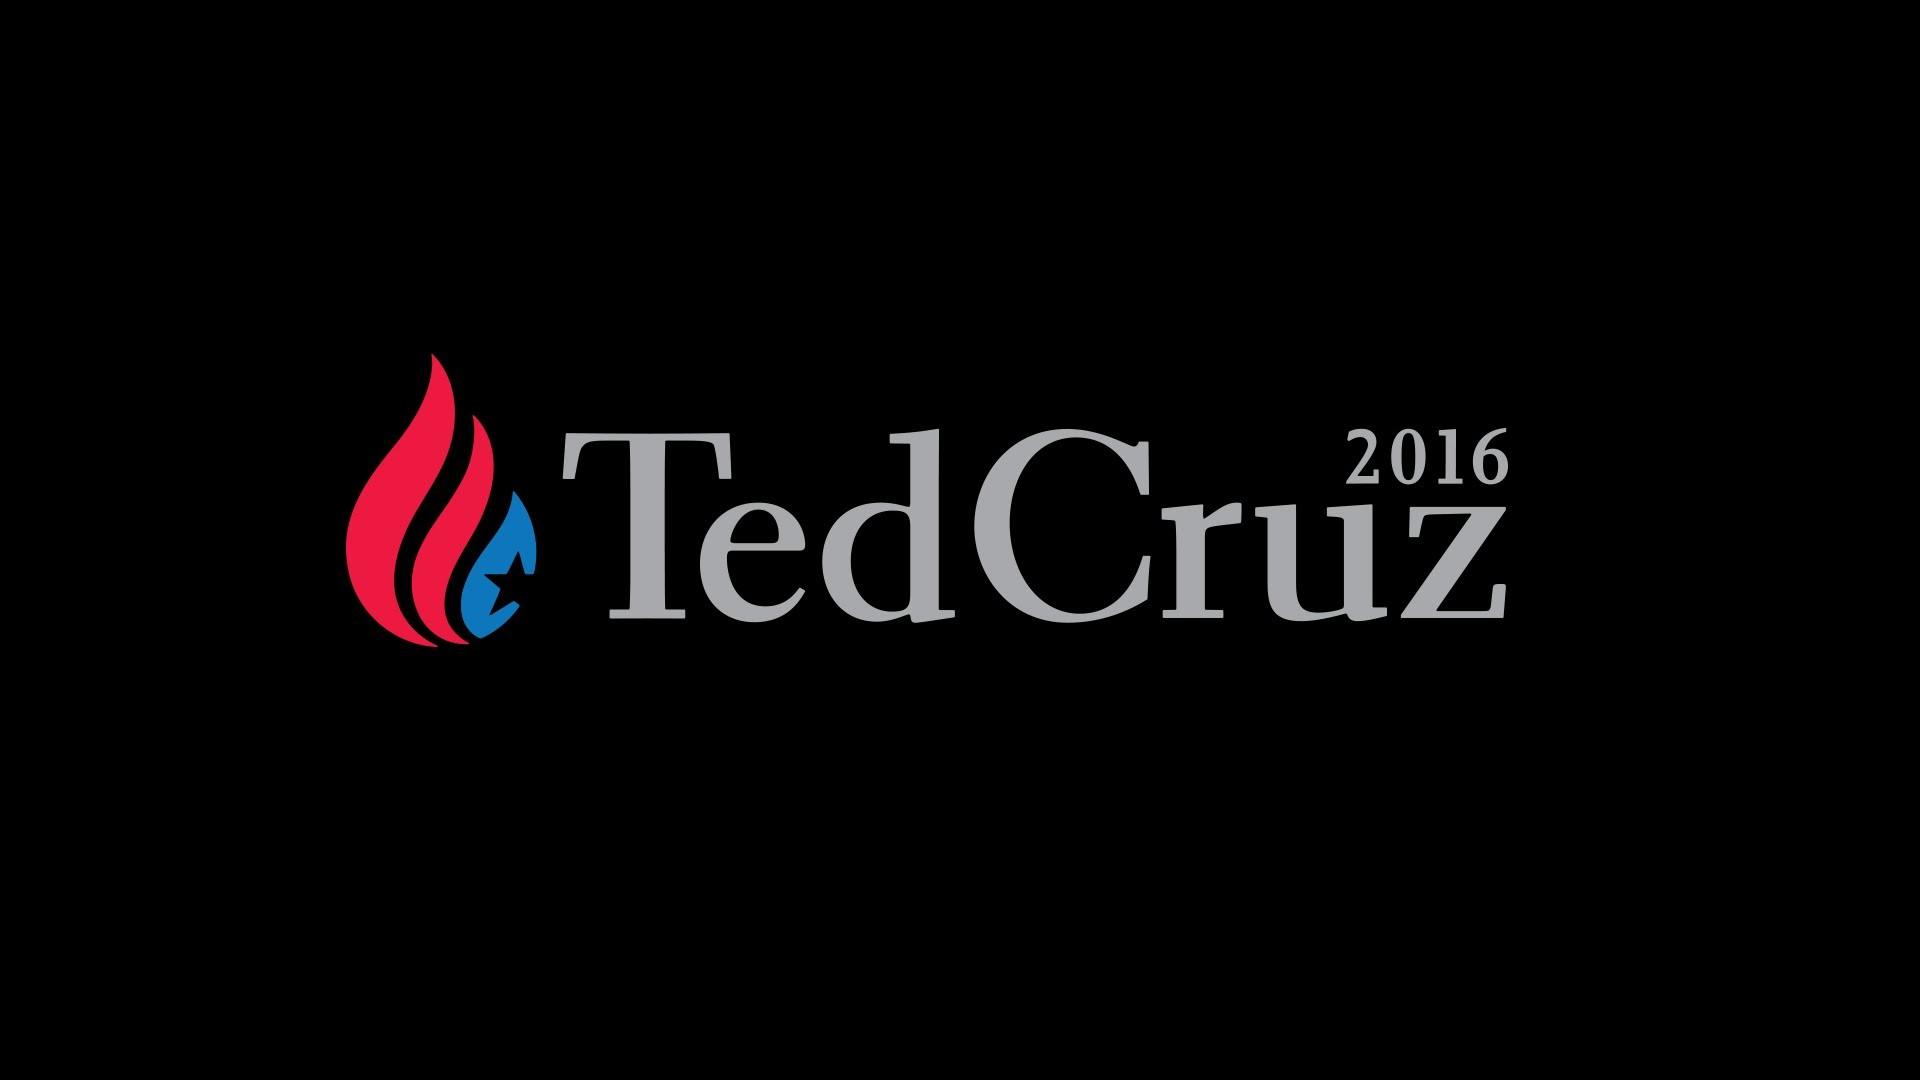 Res: 1920x1080, jrc99us goes to Senator Cruz's Regent ELS Forum #trusted #cruz2016 #tedcruz